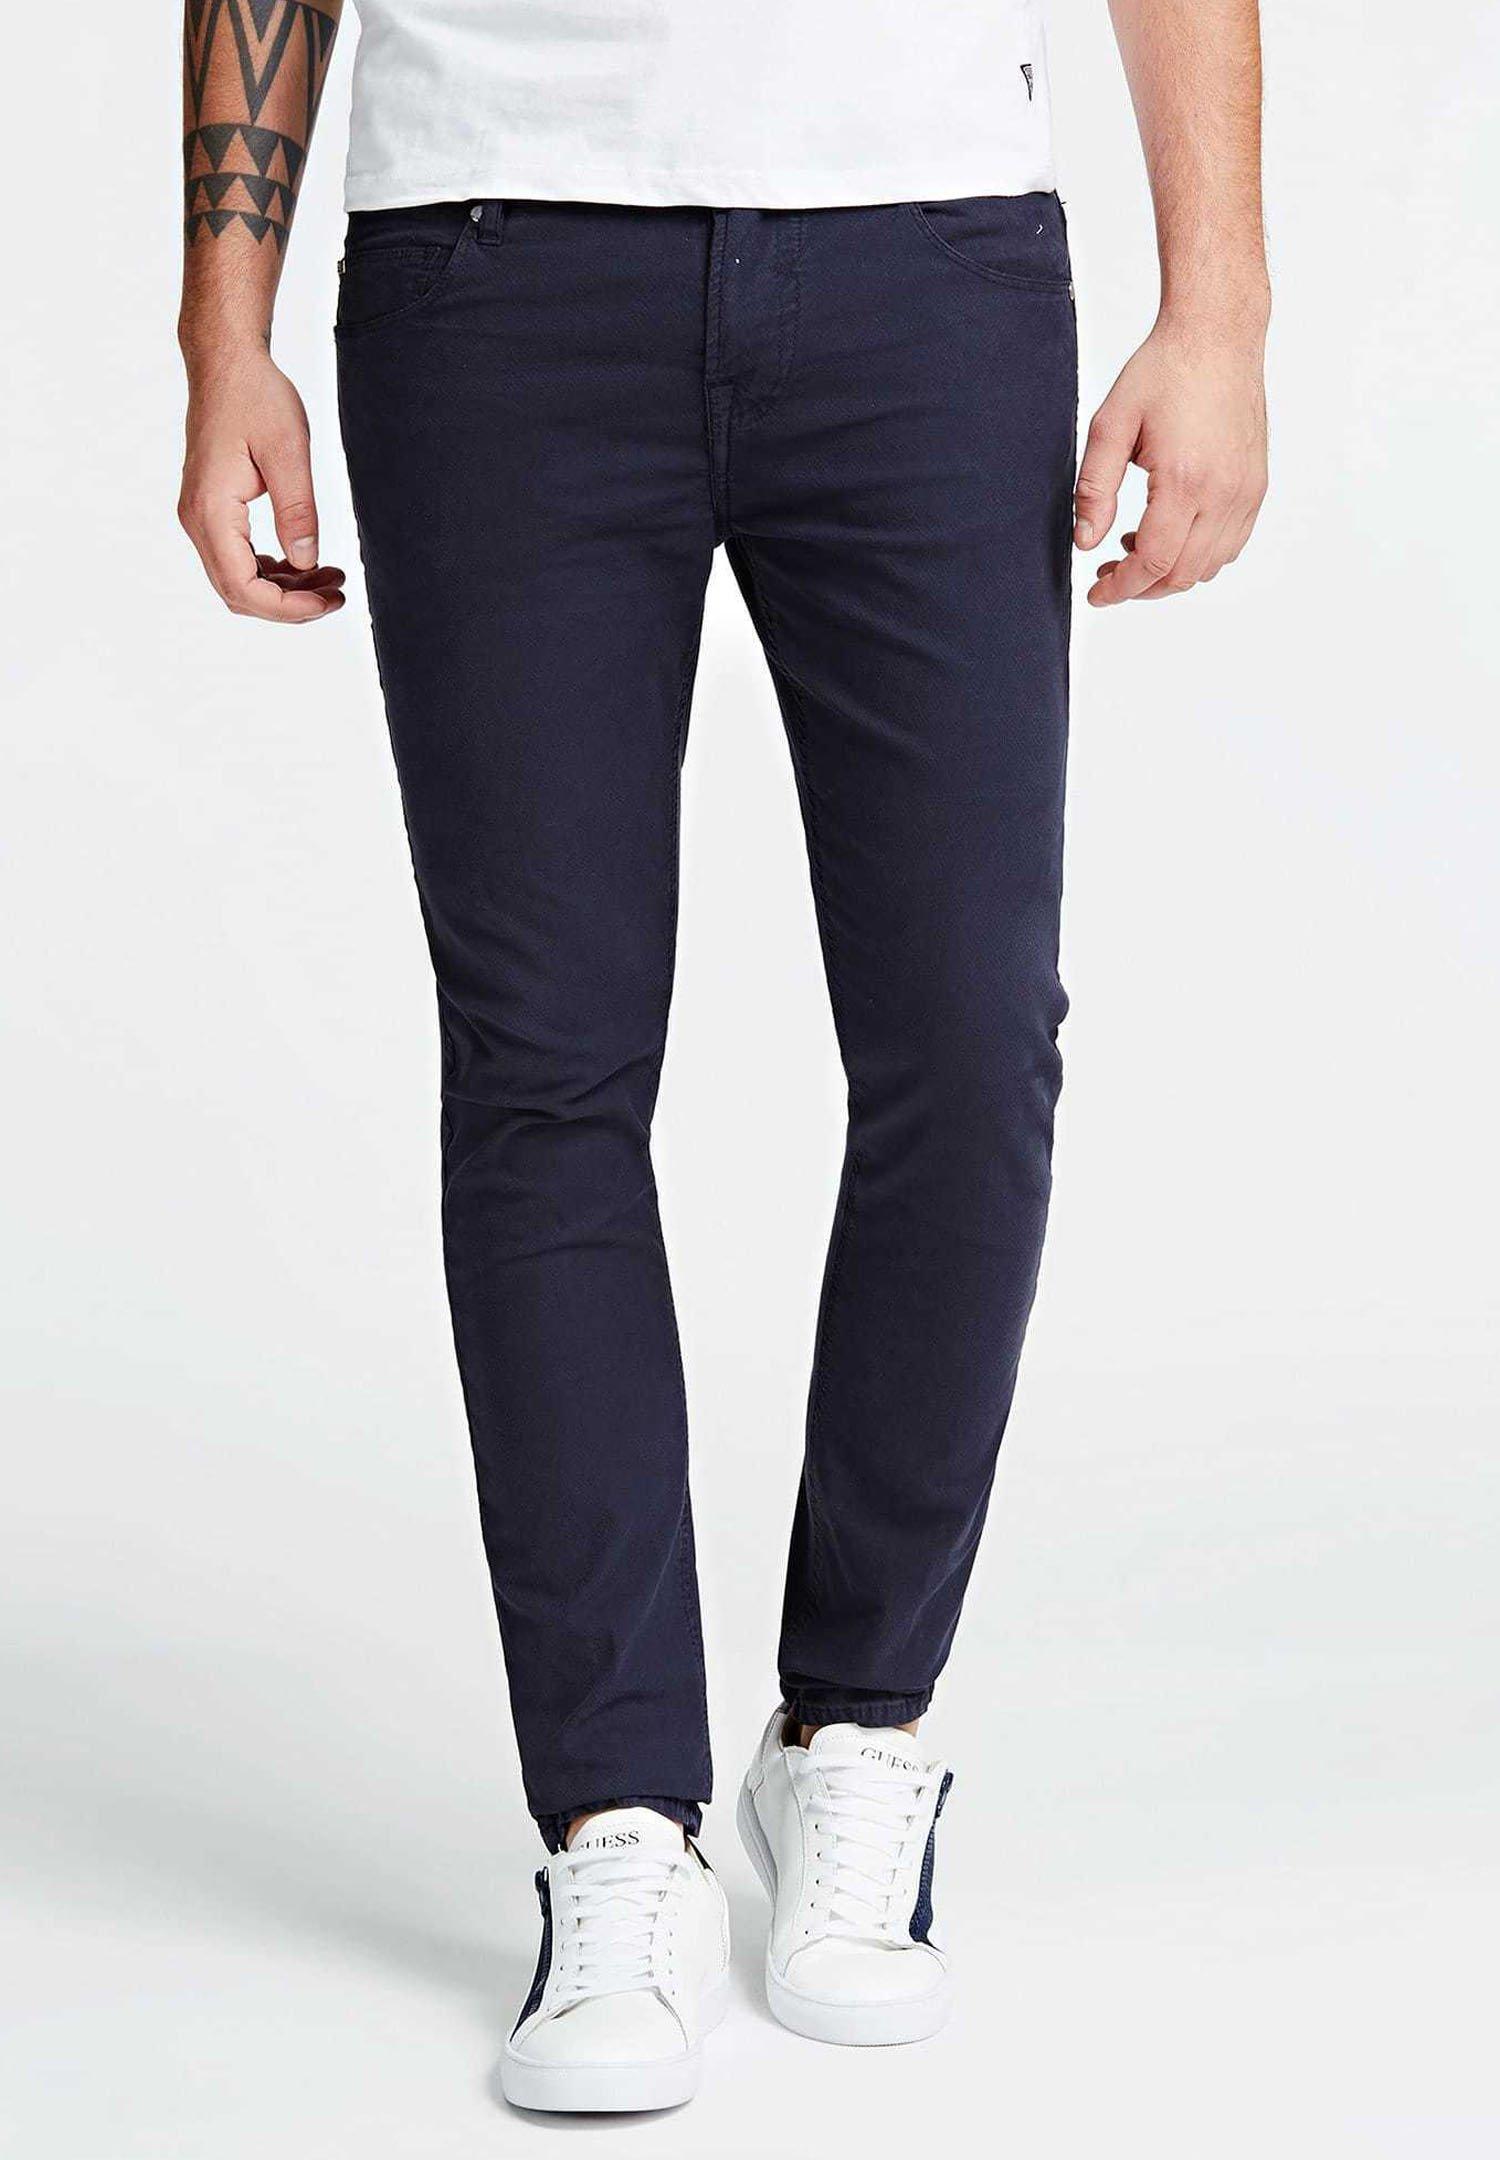 Guess GUESS SUPER SKINNY HOSE - Jeans Skinny Fit - dunkelblau